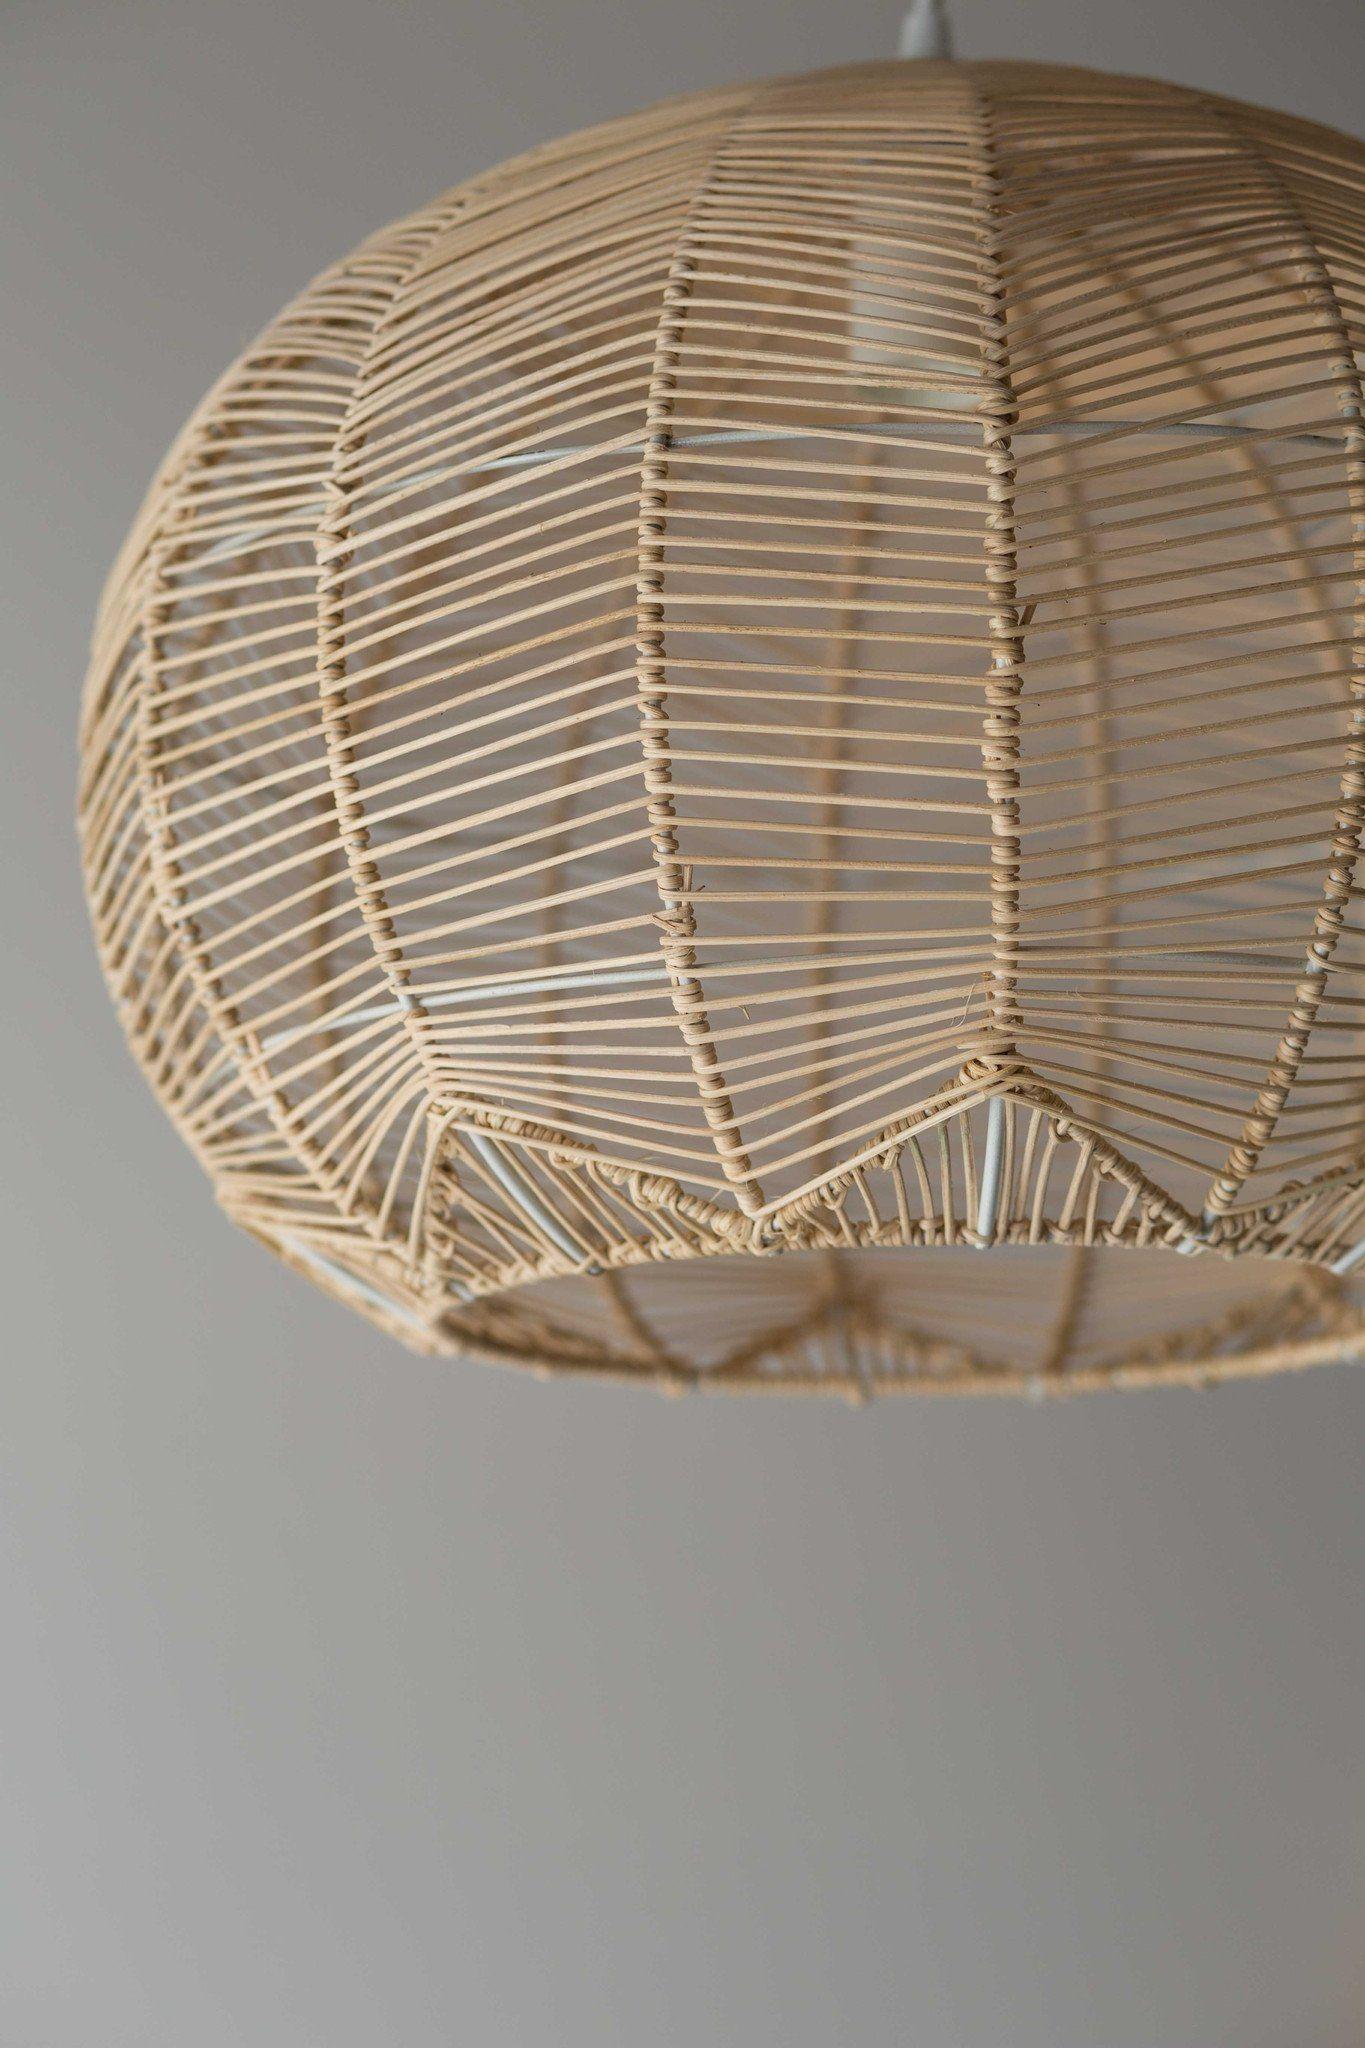 Natural round rattan pendant - pre order | Pinterest ...